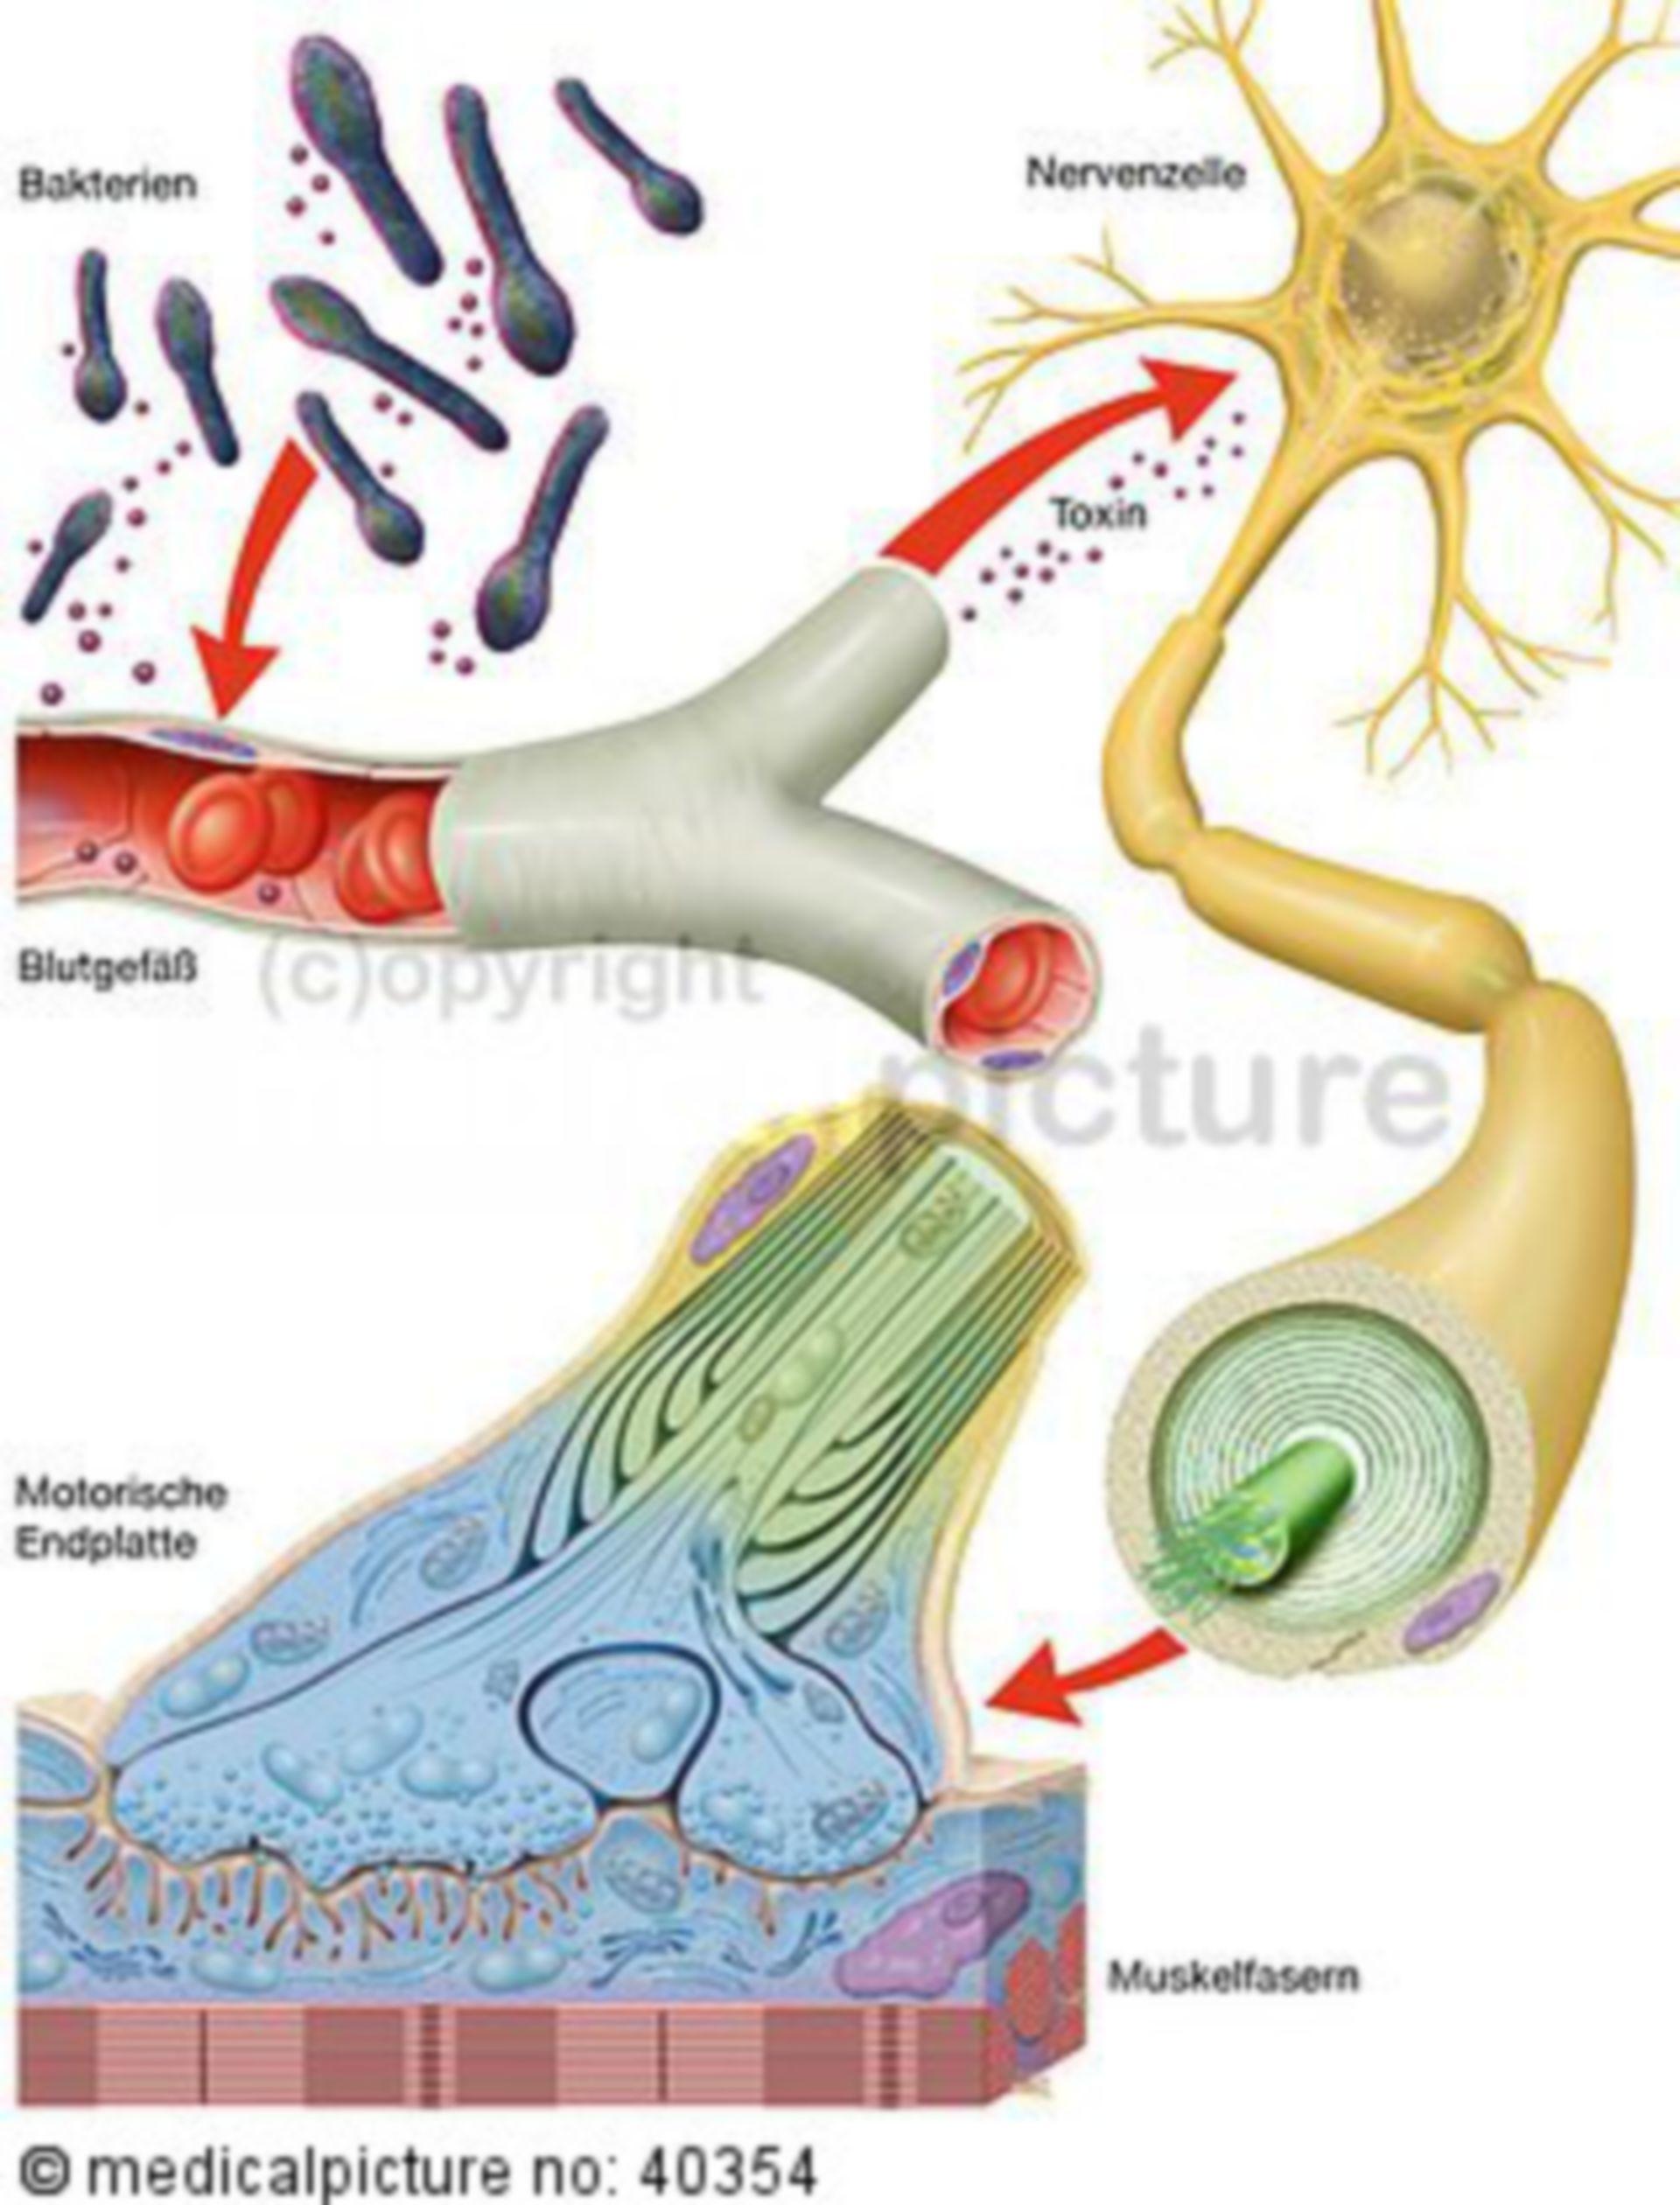 Clostridium tetani, tetanus: Path of infection